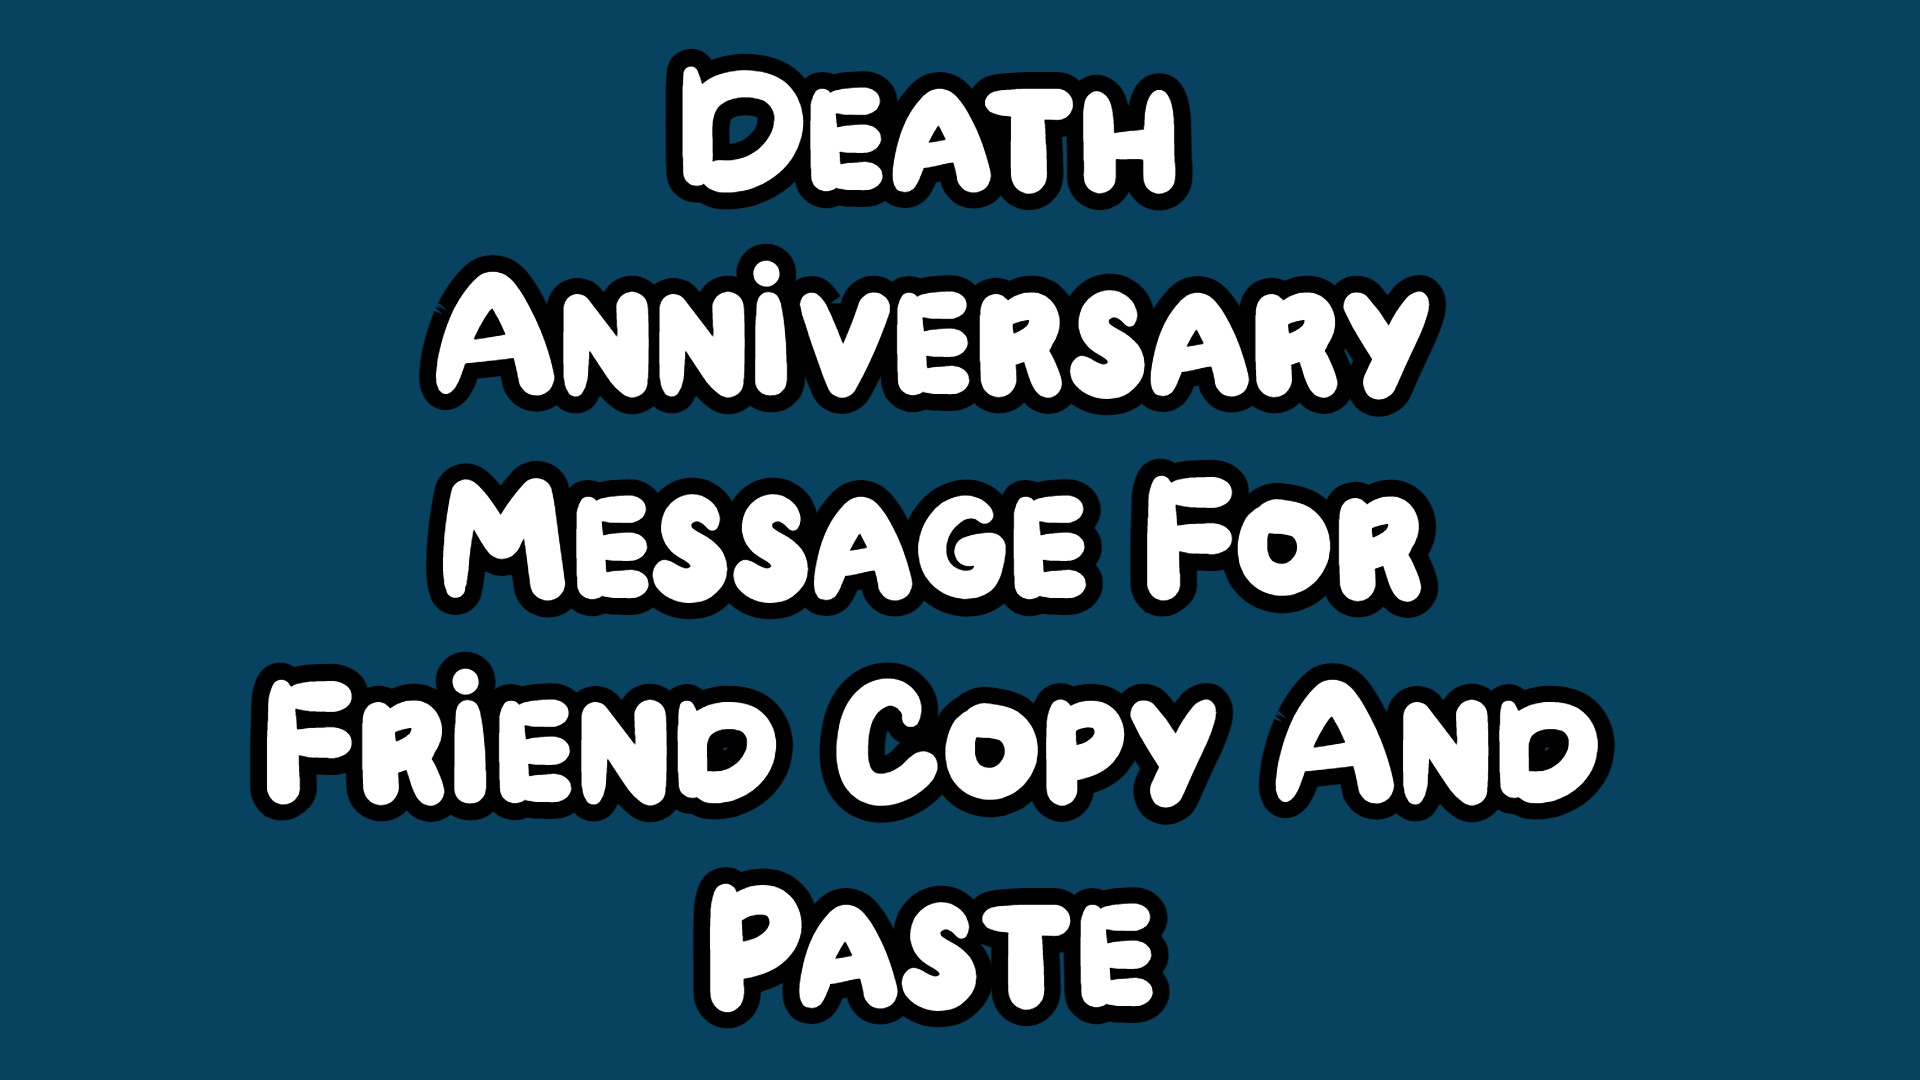 Death Anniversary Message For Friend